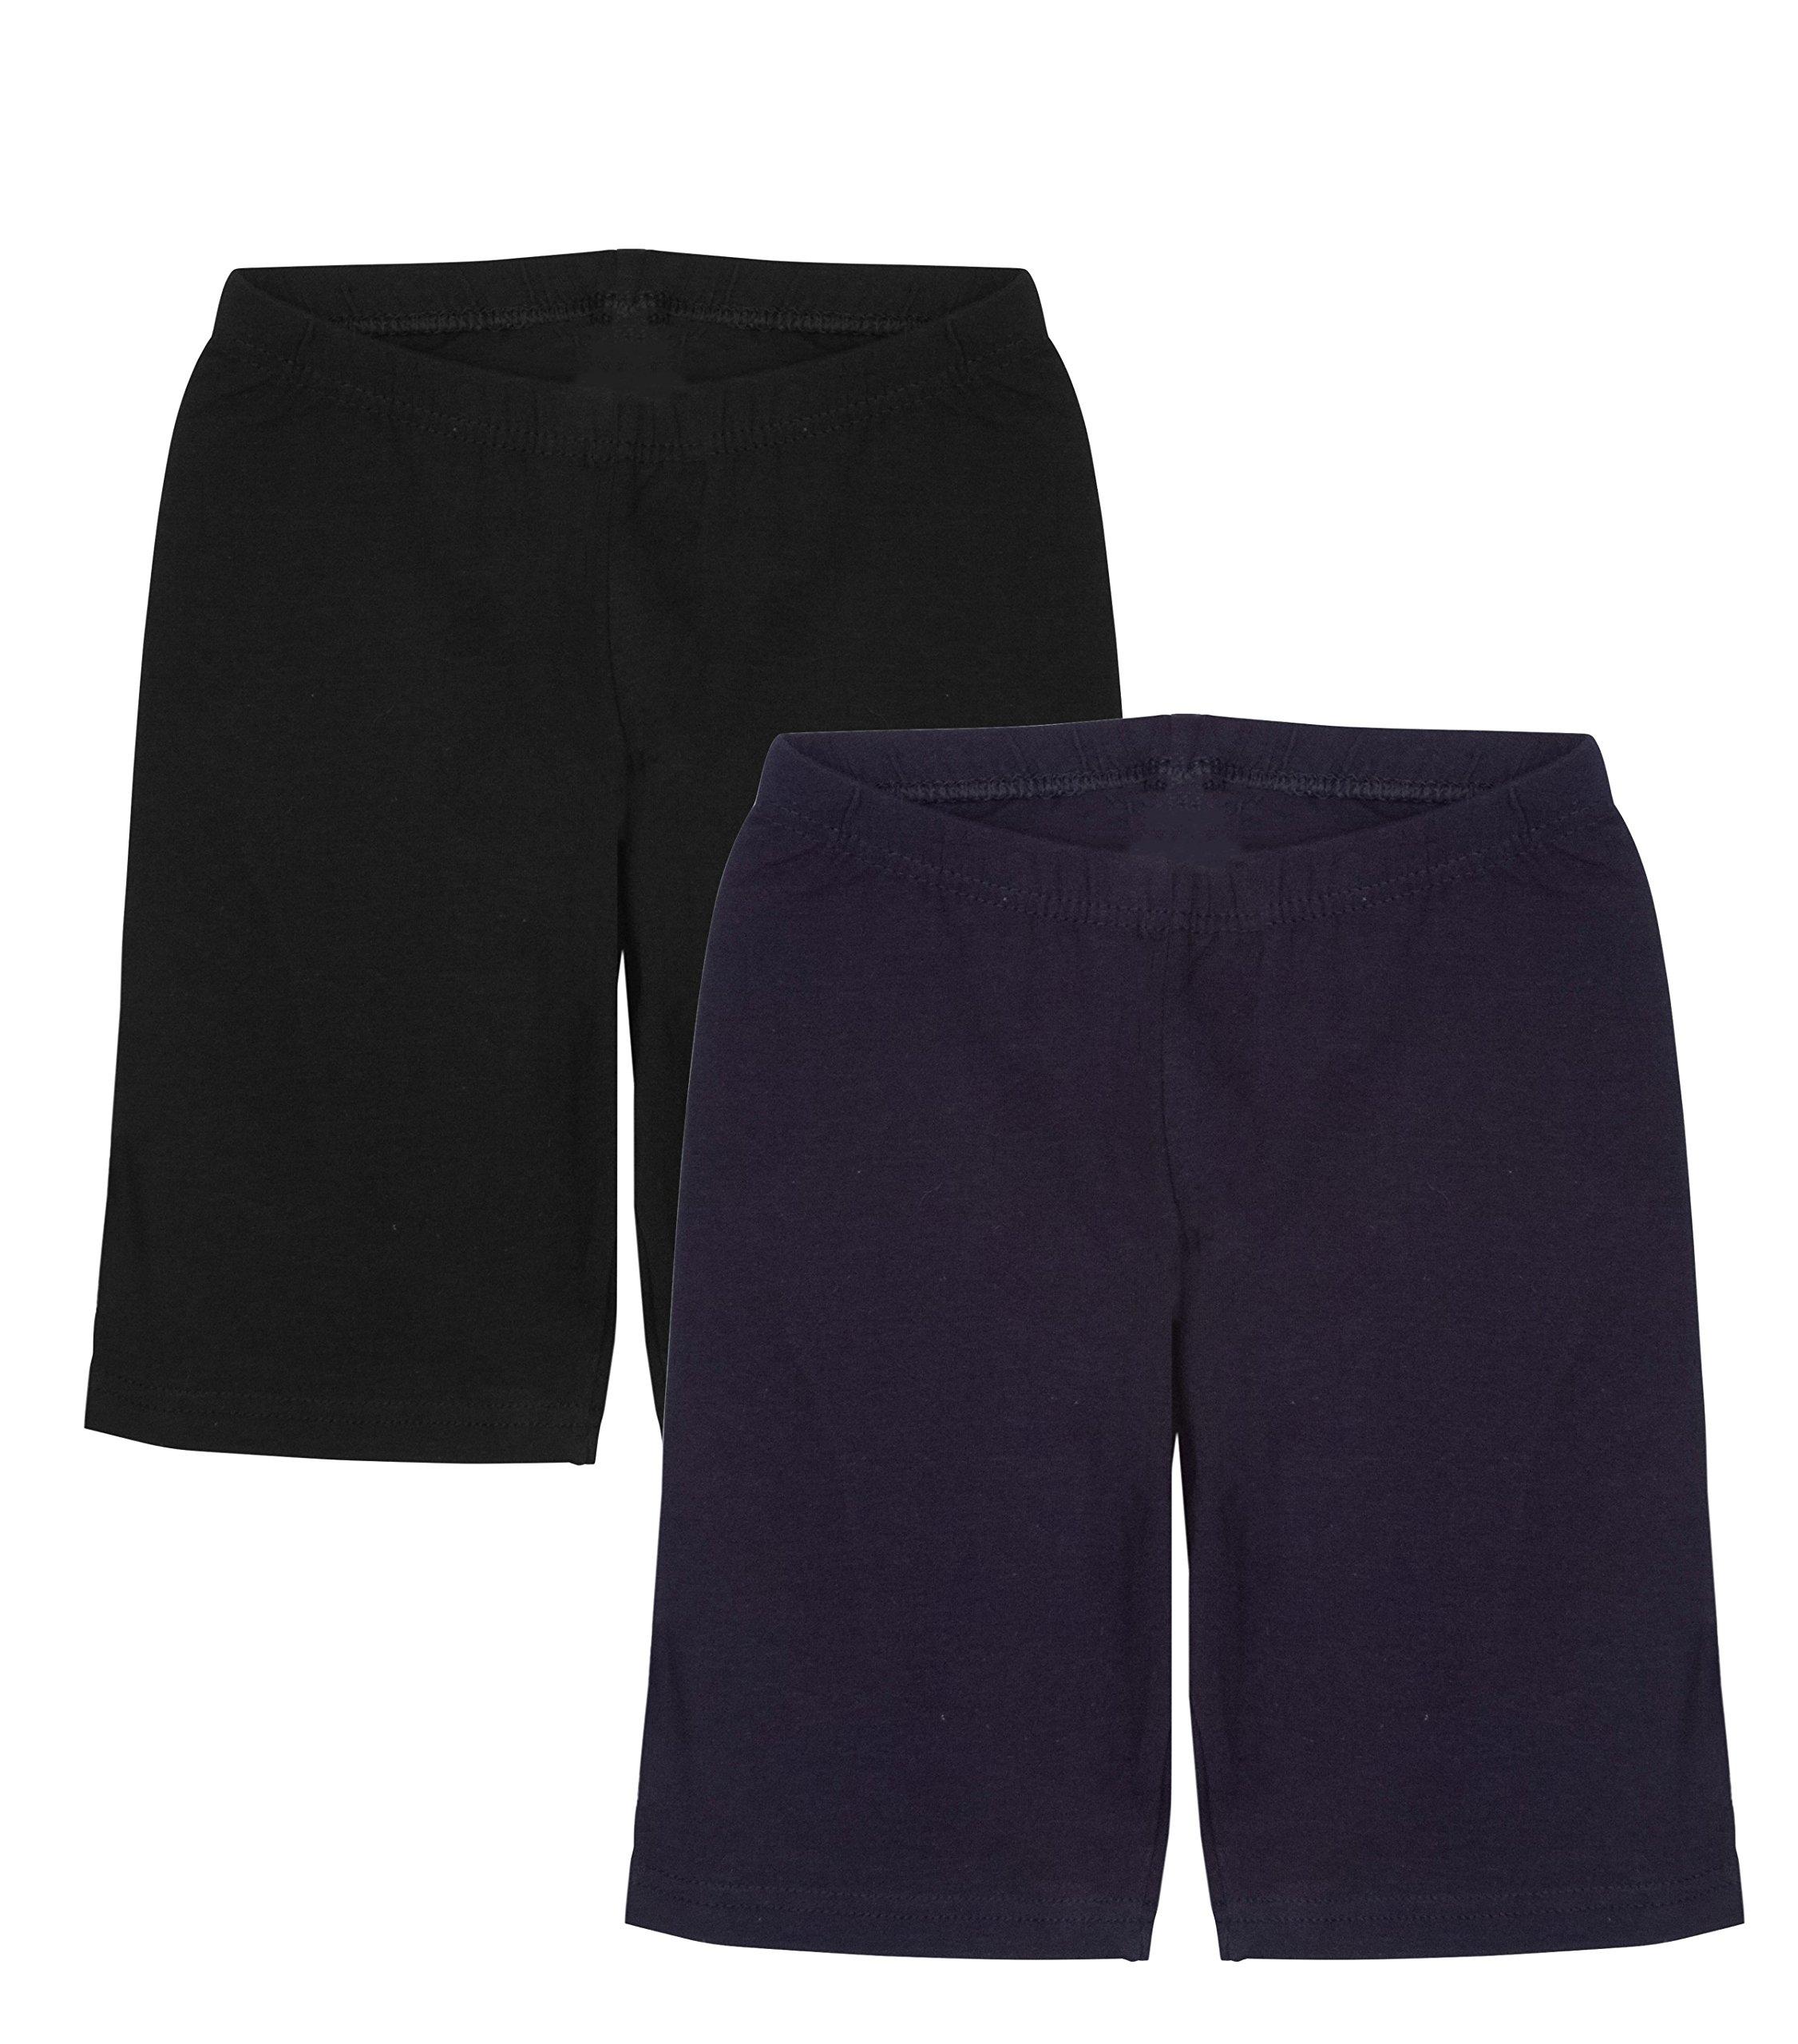 Unique Styles Girls Capri Crop Leggings Cotton Shorts Tights Pants for Kids (Large, 2-PK: Black, Navy)